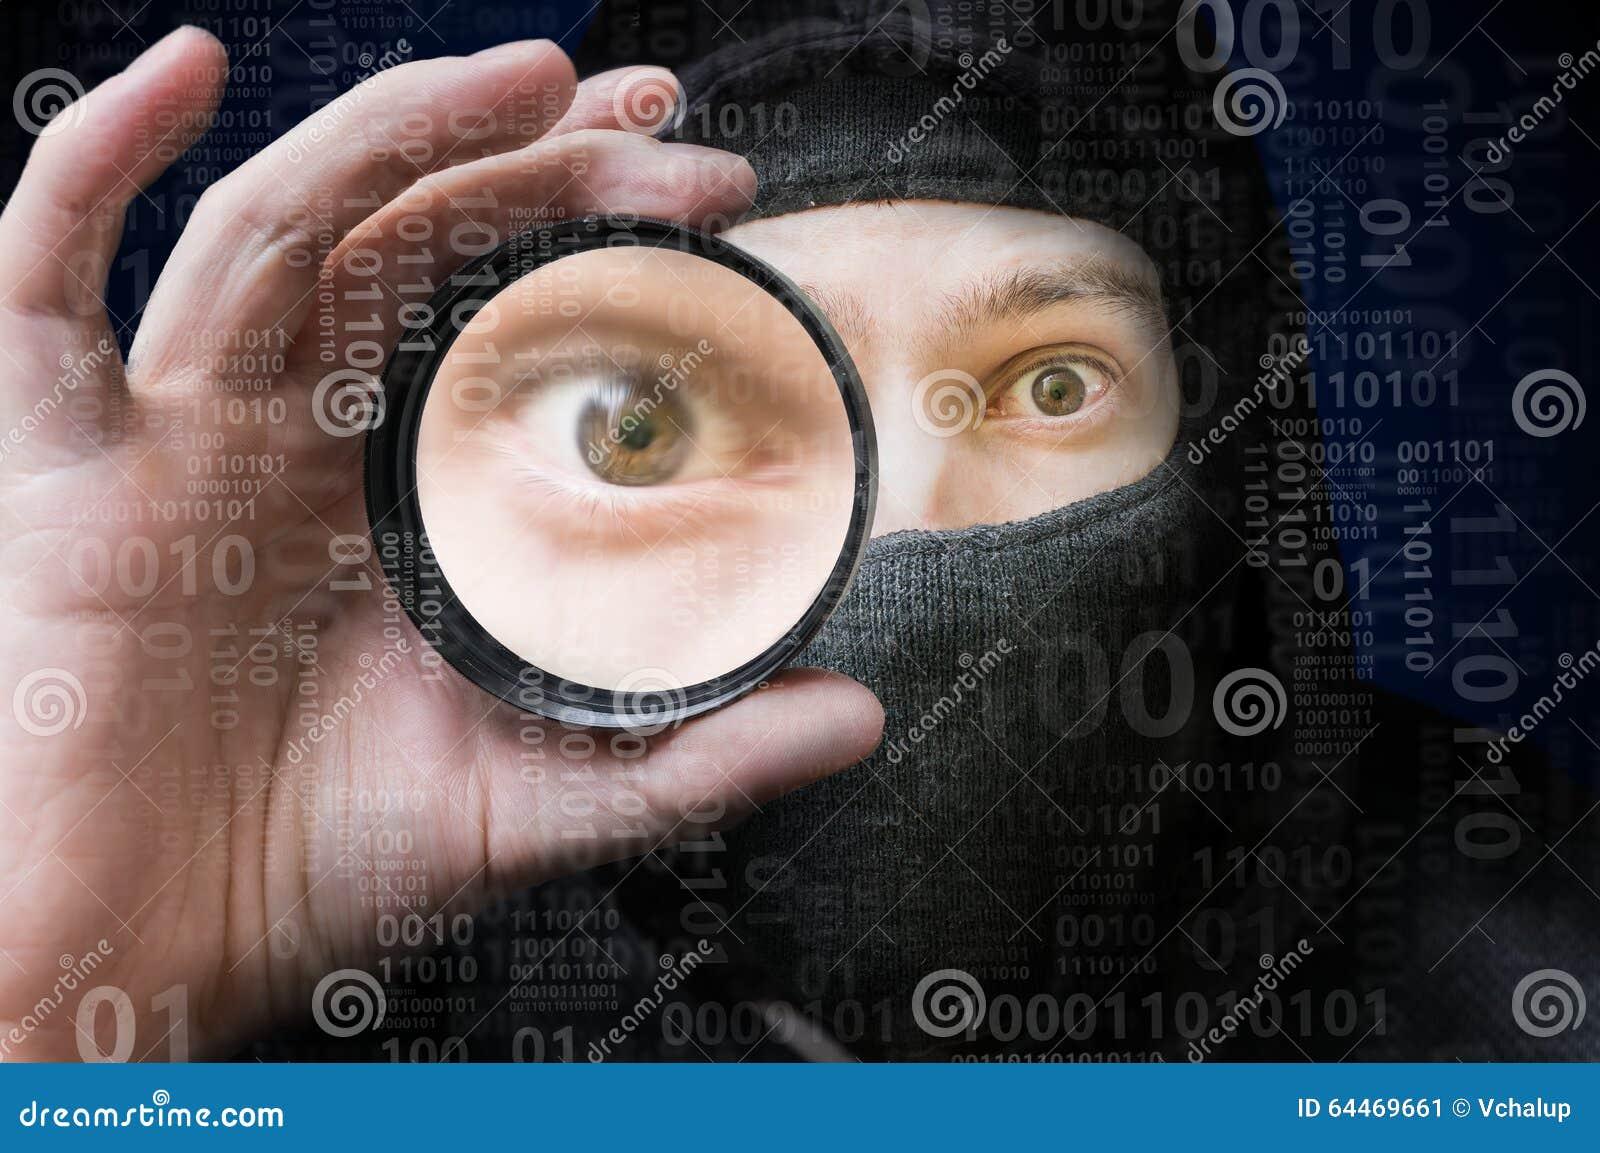 Pirate informatique anonyme masqué balayant le code binaire